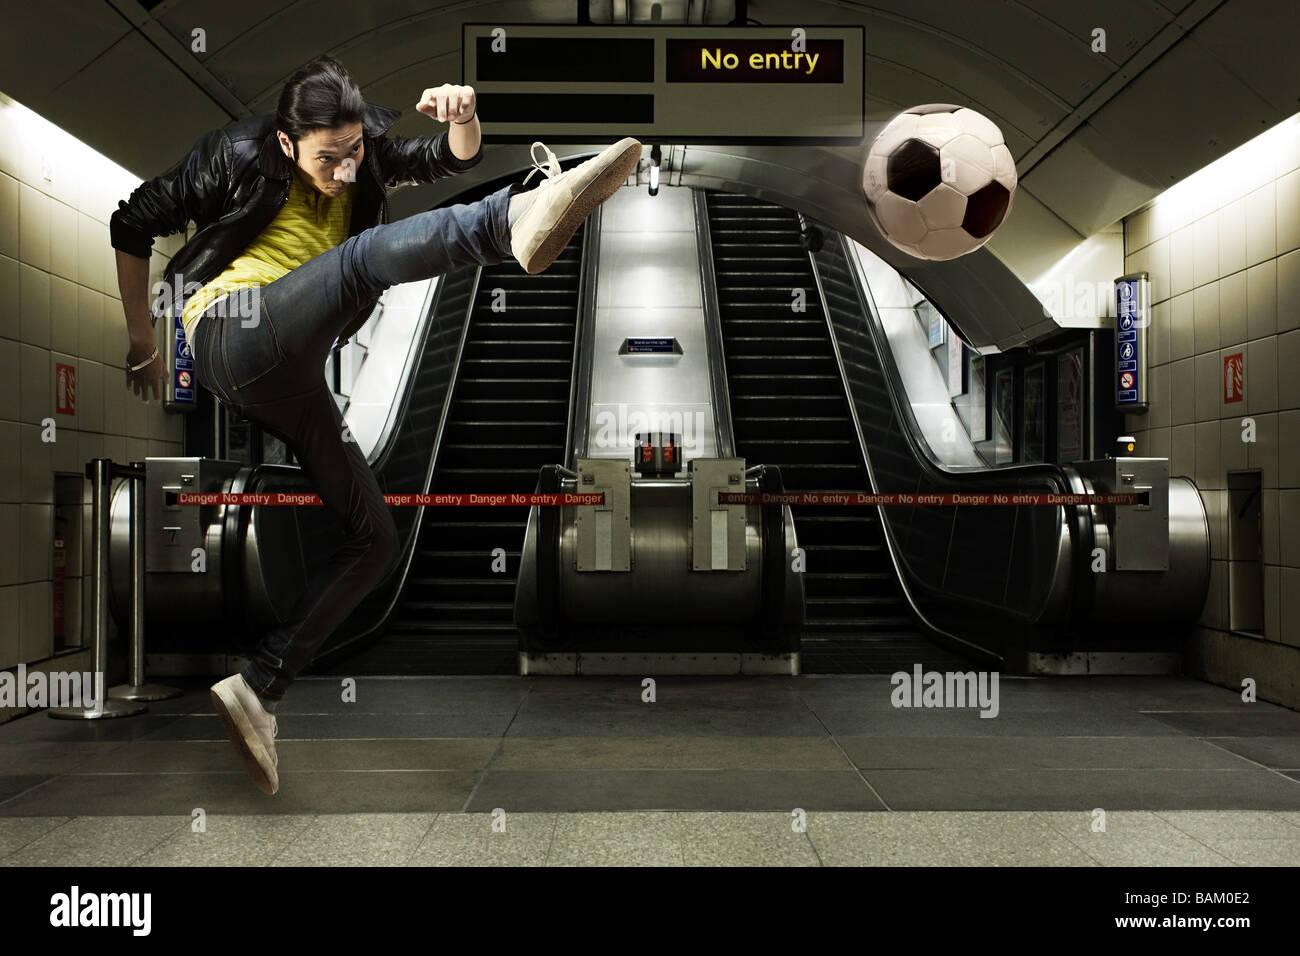 A young man kicking a football - Stock Image